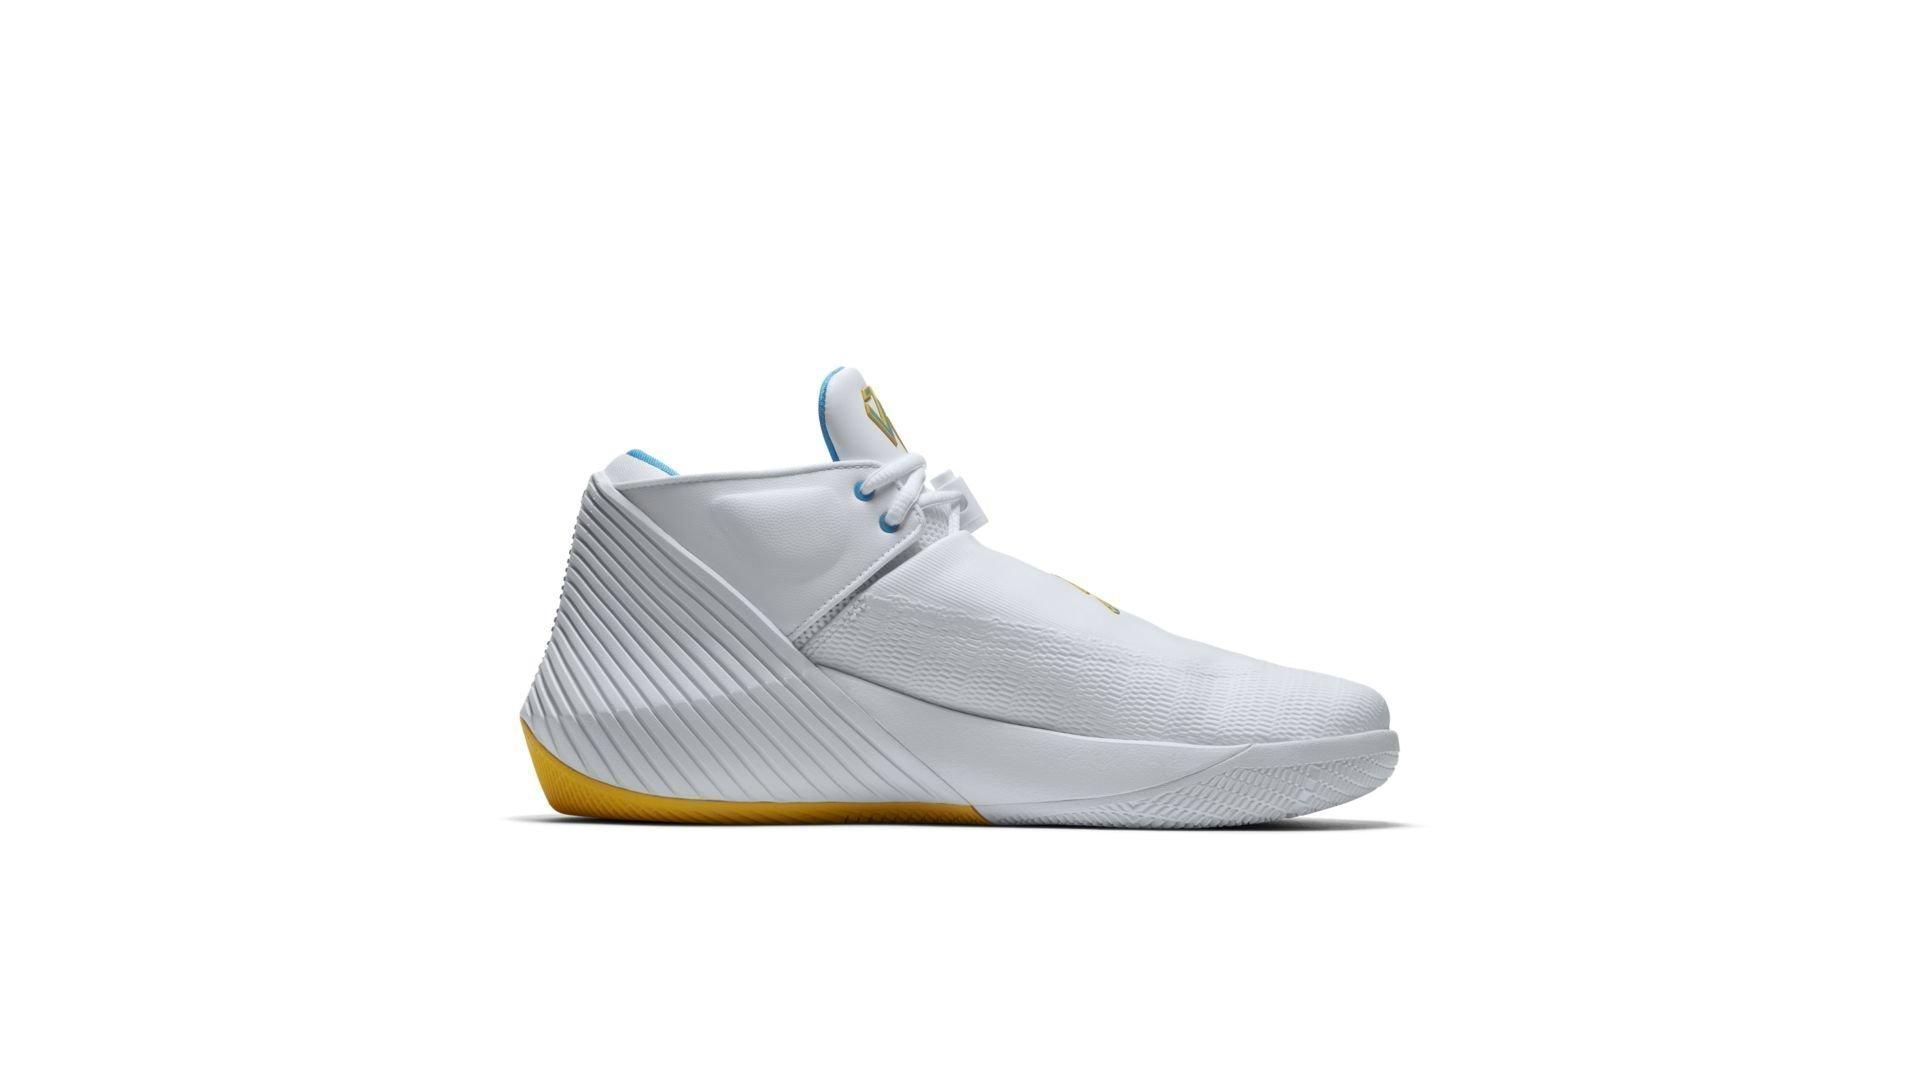 Jordan Why Not Zer0.1 Low UCLA (AR0043-100)